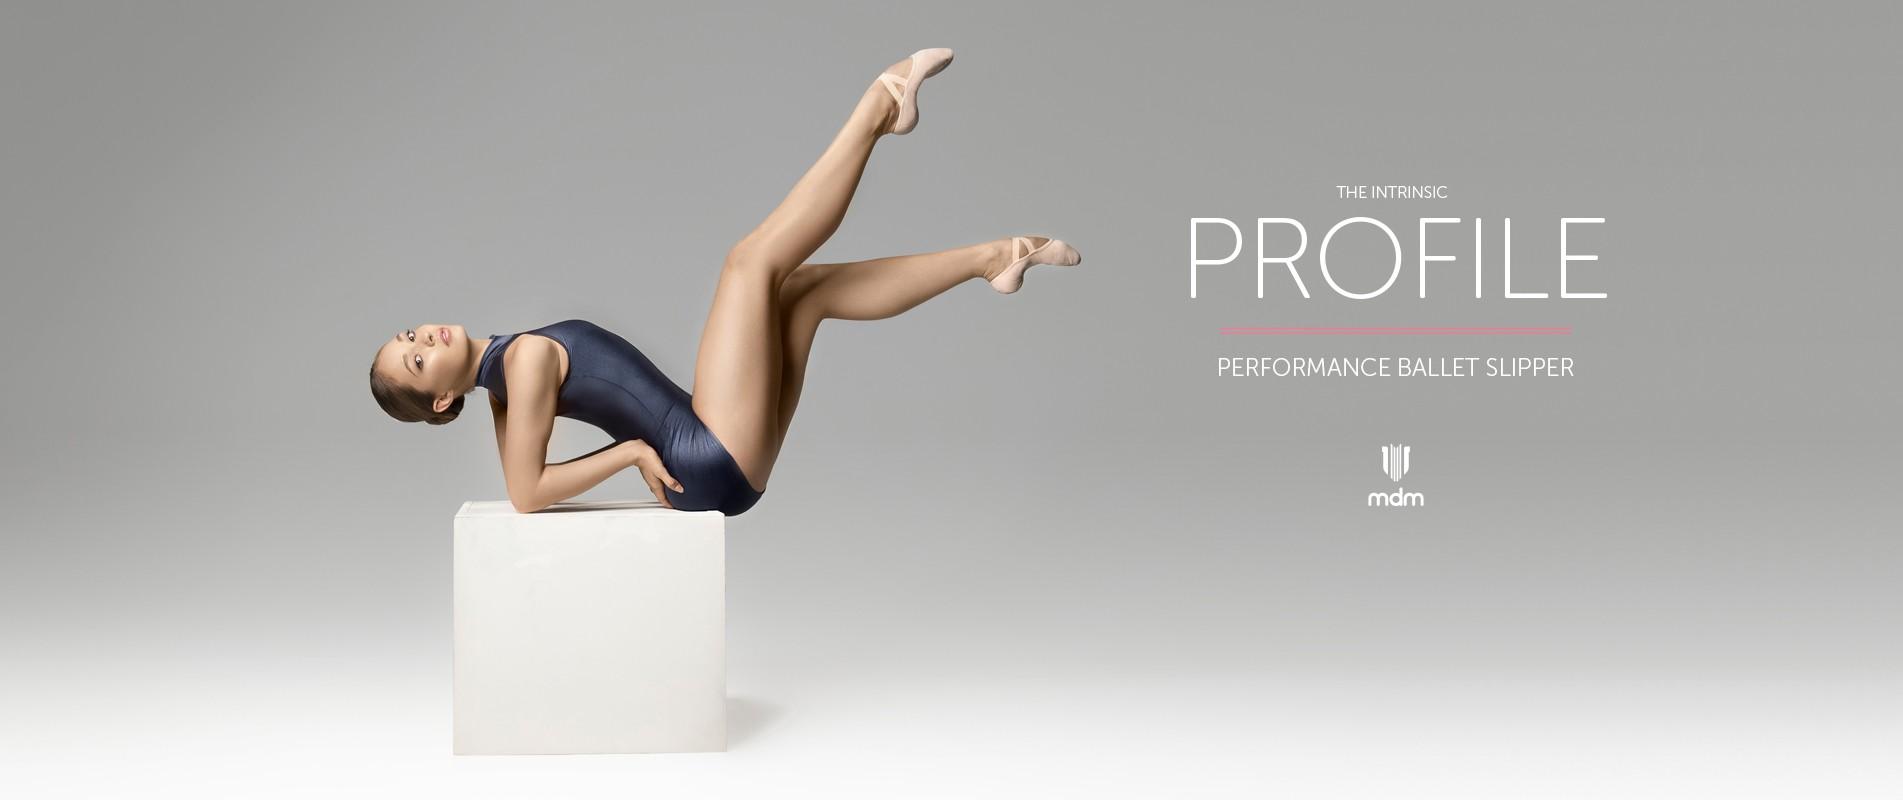 MDM flexibili ortopedici pentru balet